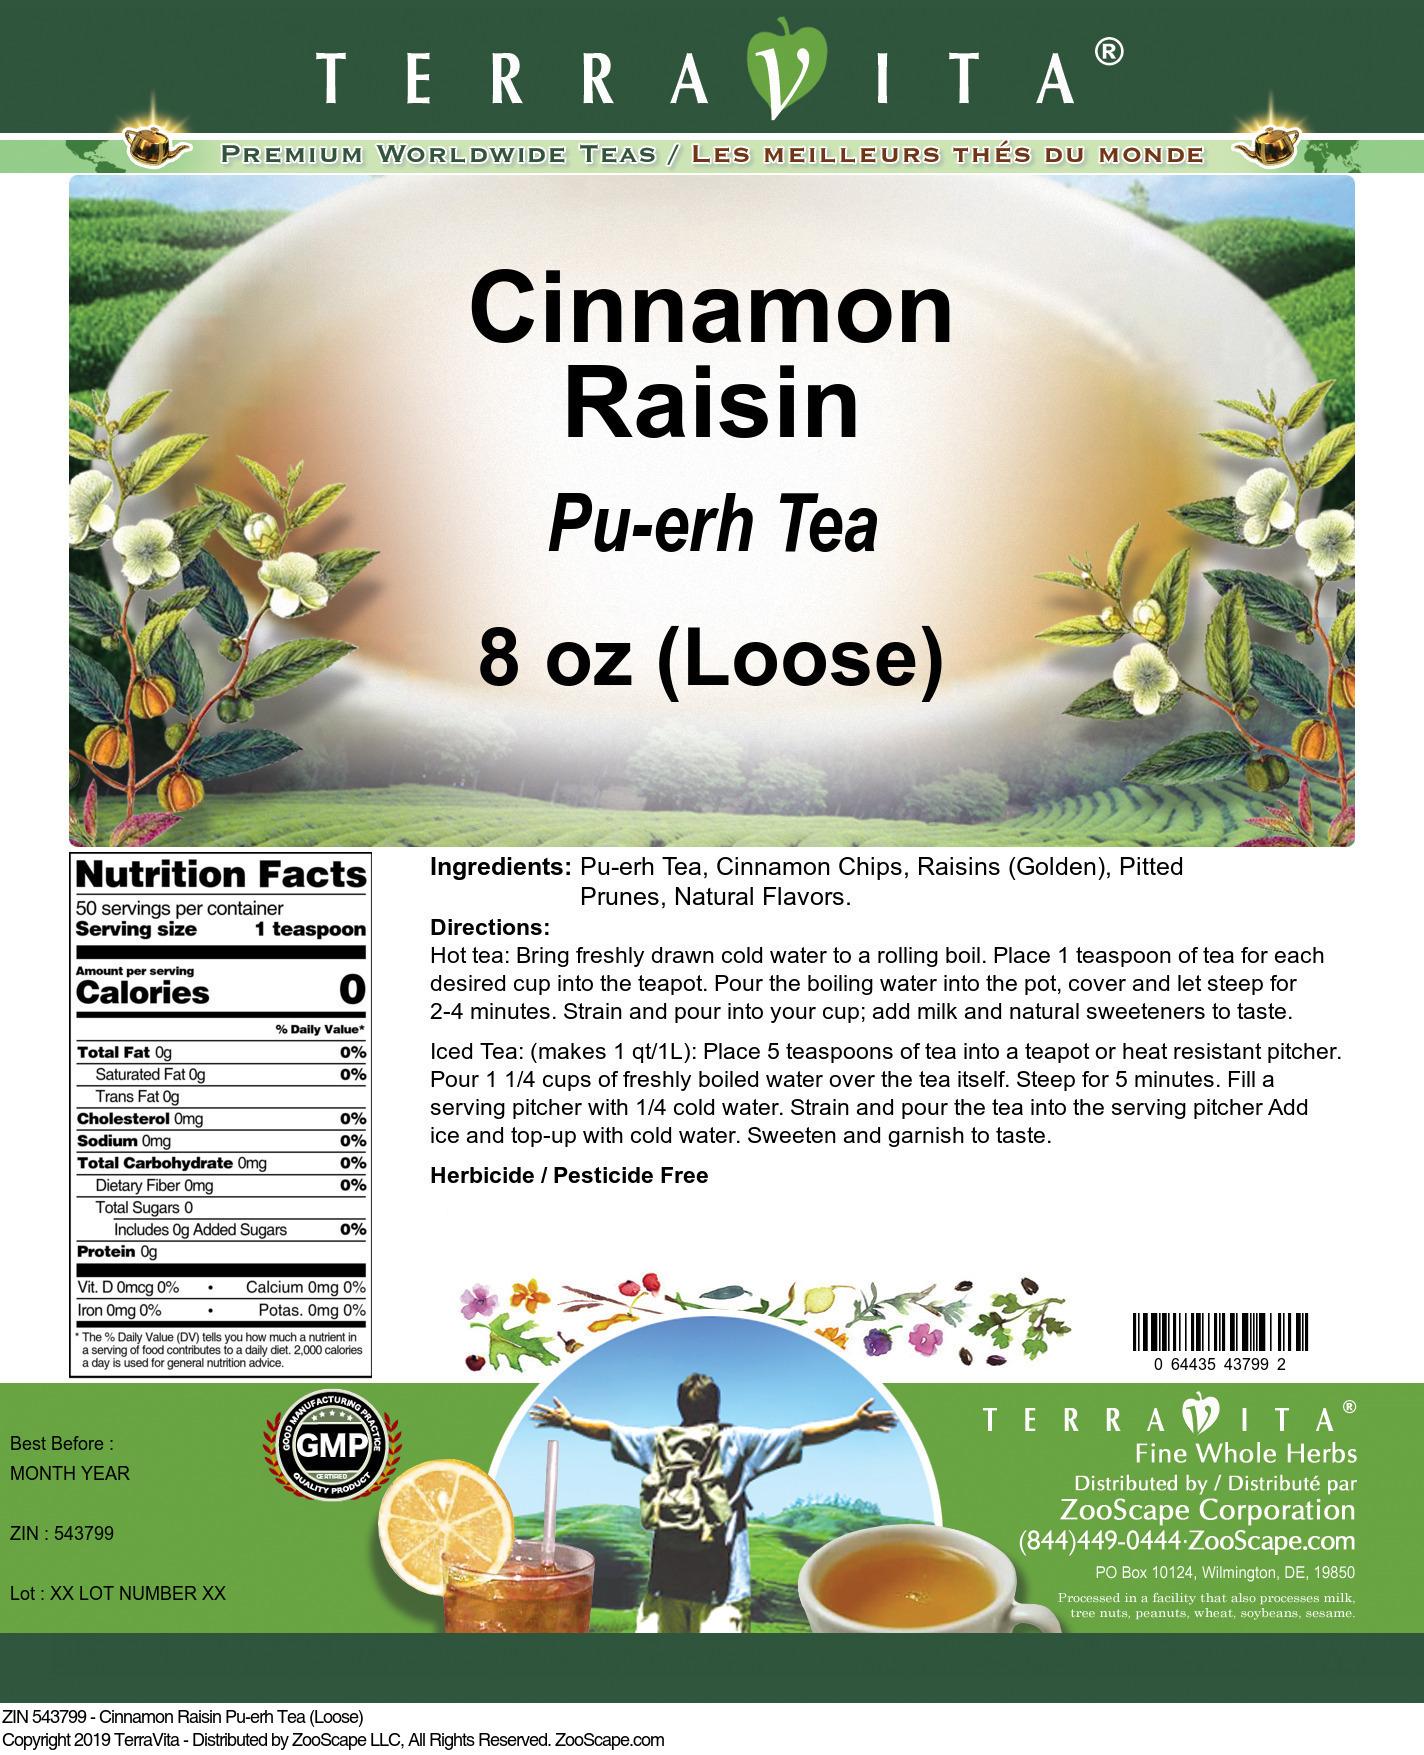 Cinnamon Raisin Pu-erh Tea